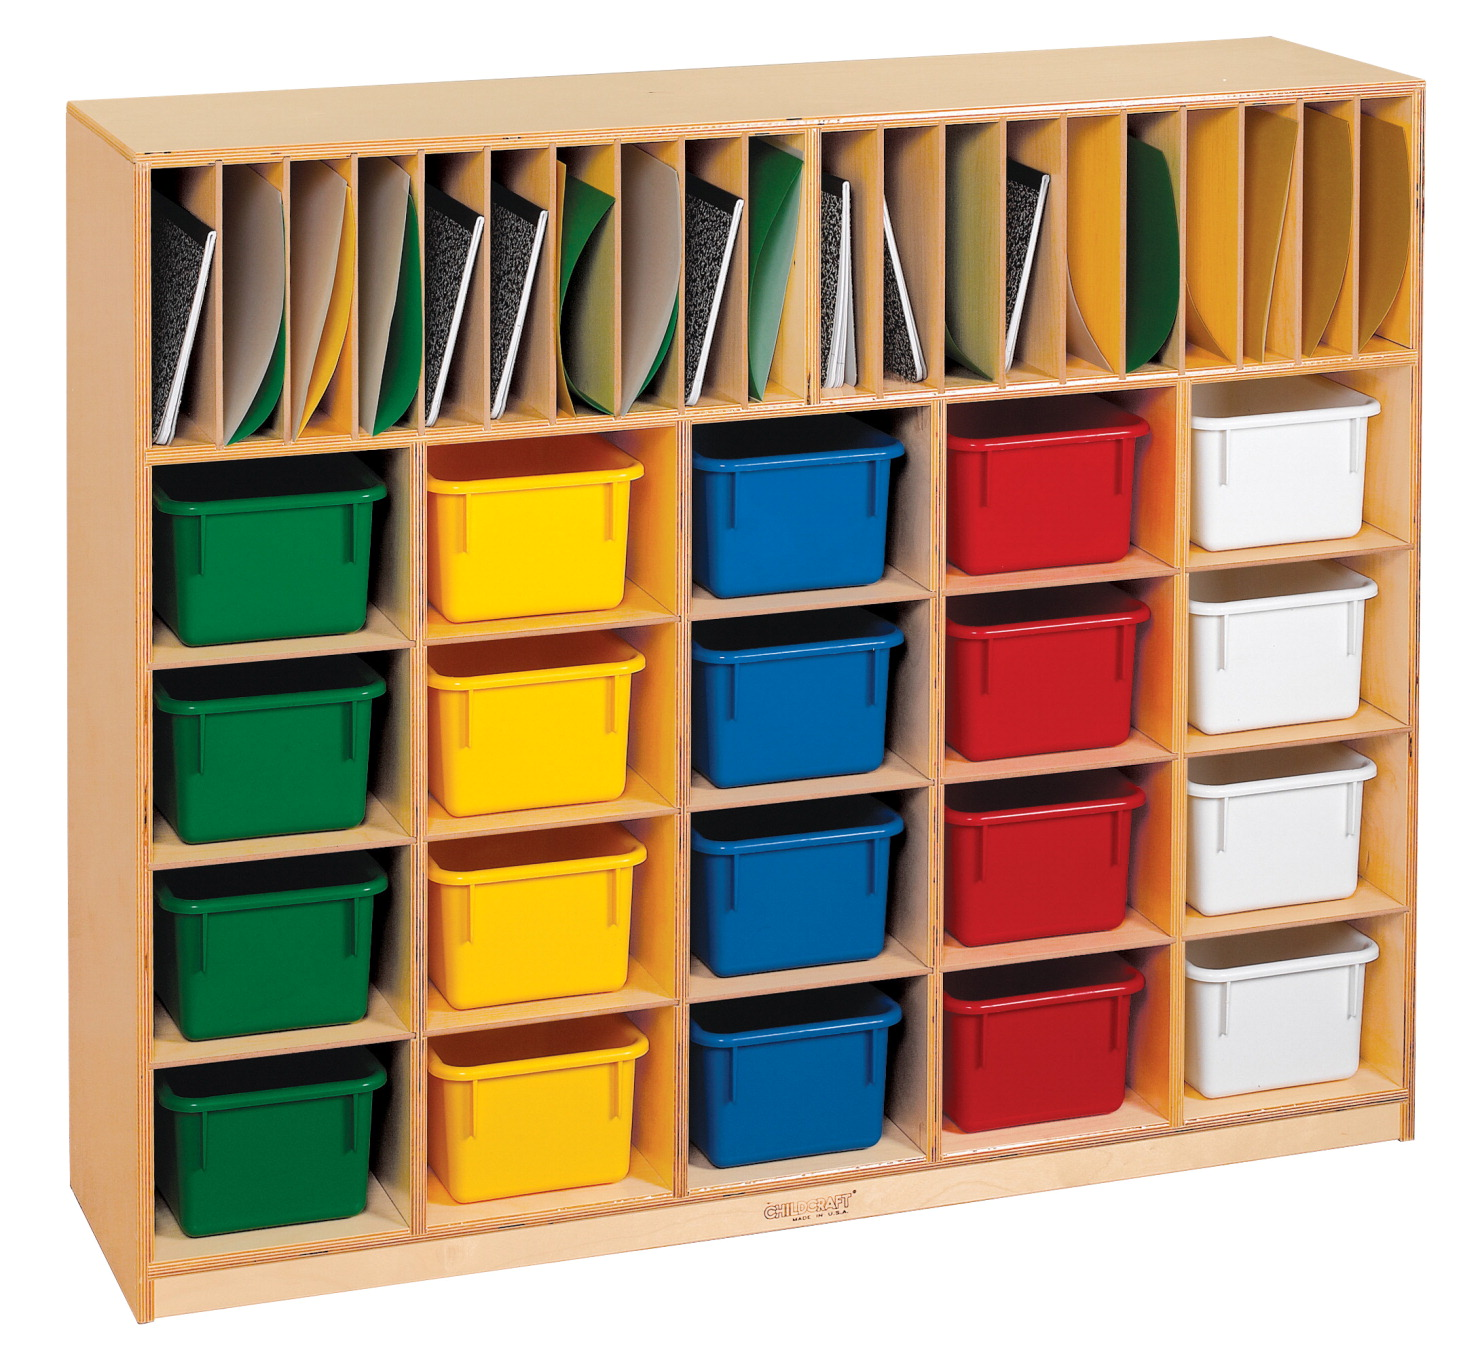 Childcraft Folder And Tray Cubby 20 Tray Capacity